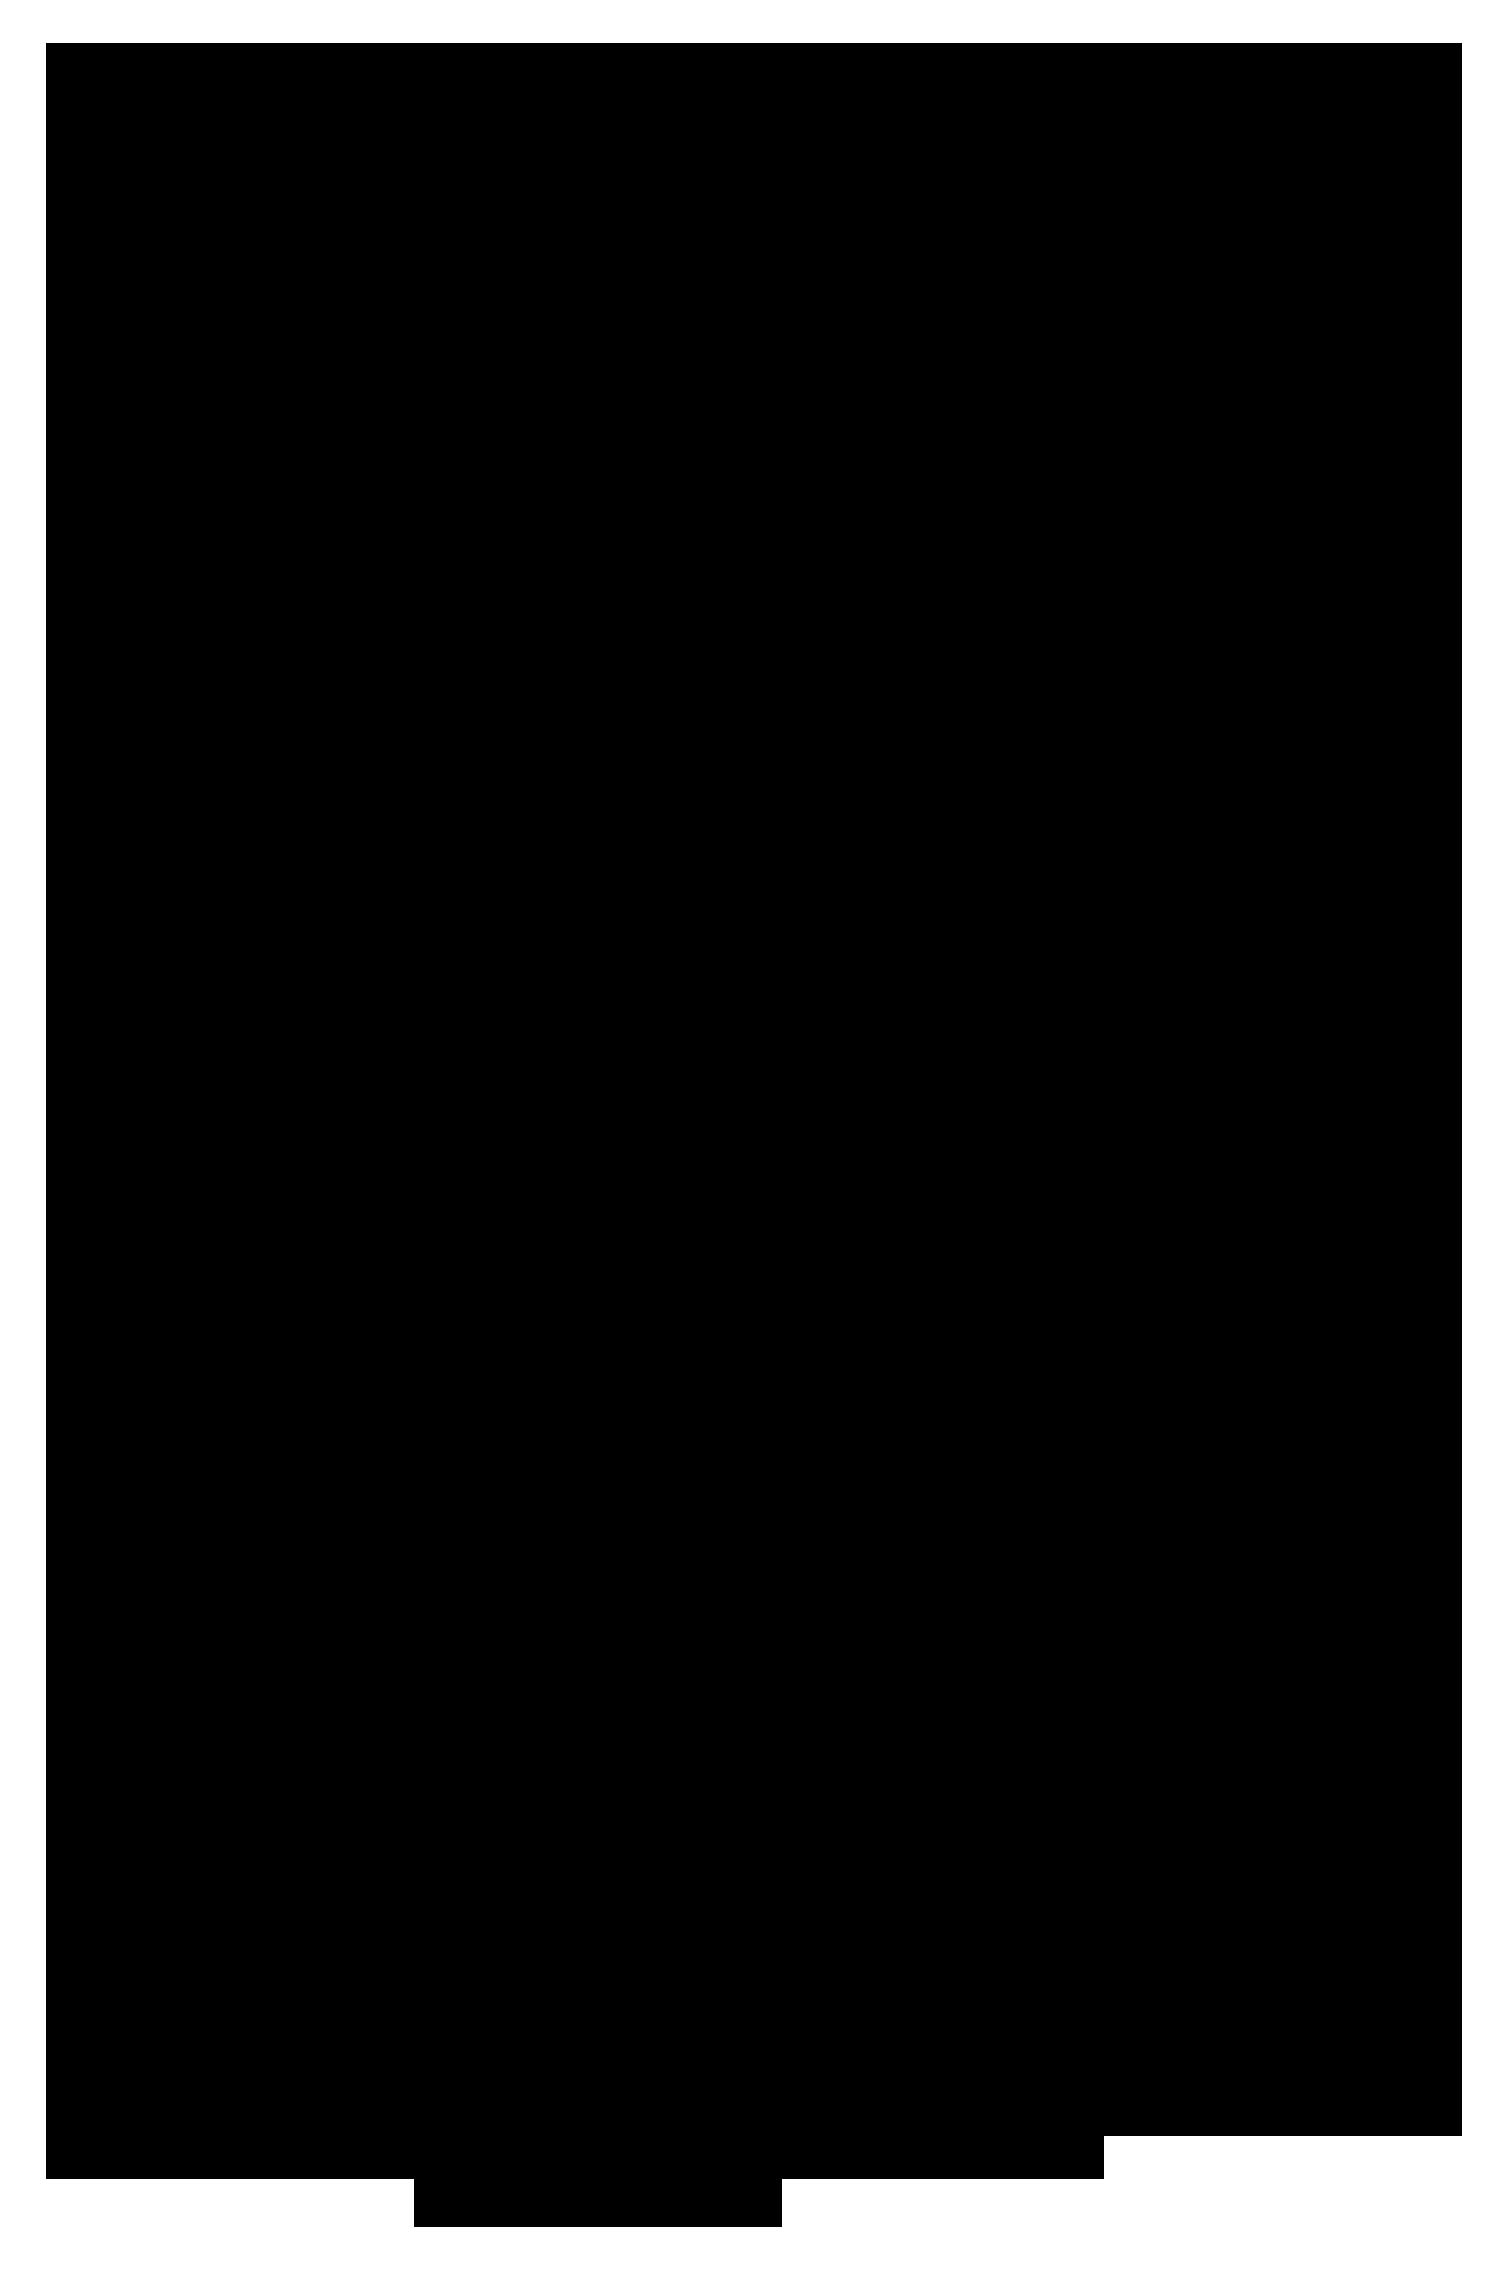 Thong n Dance logo (black)